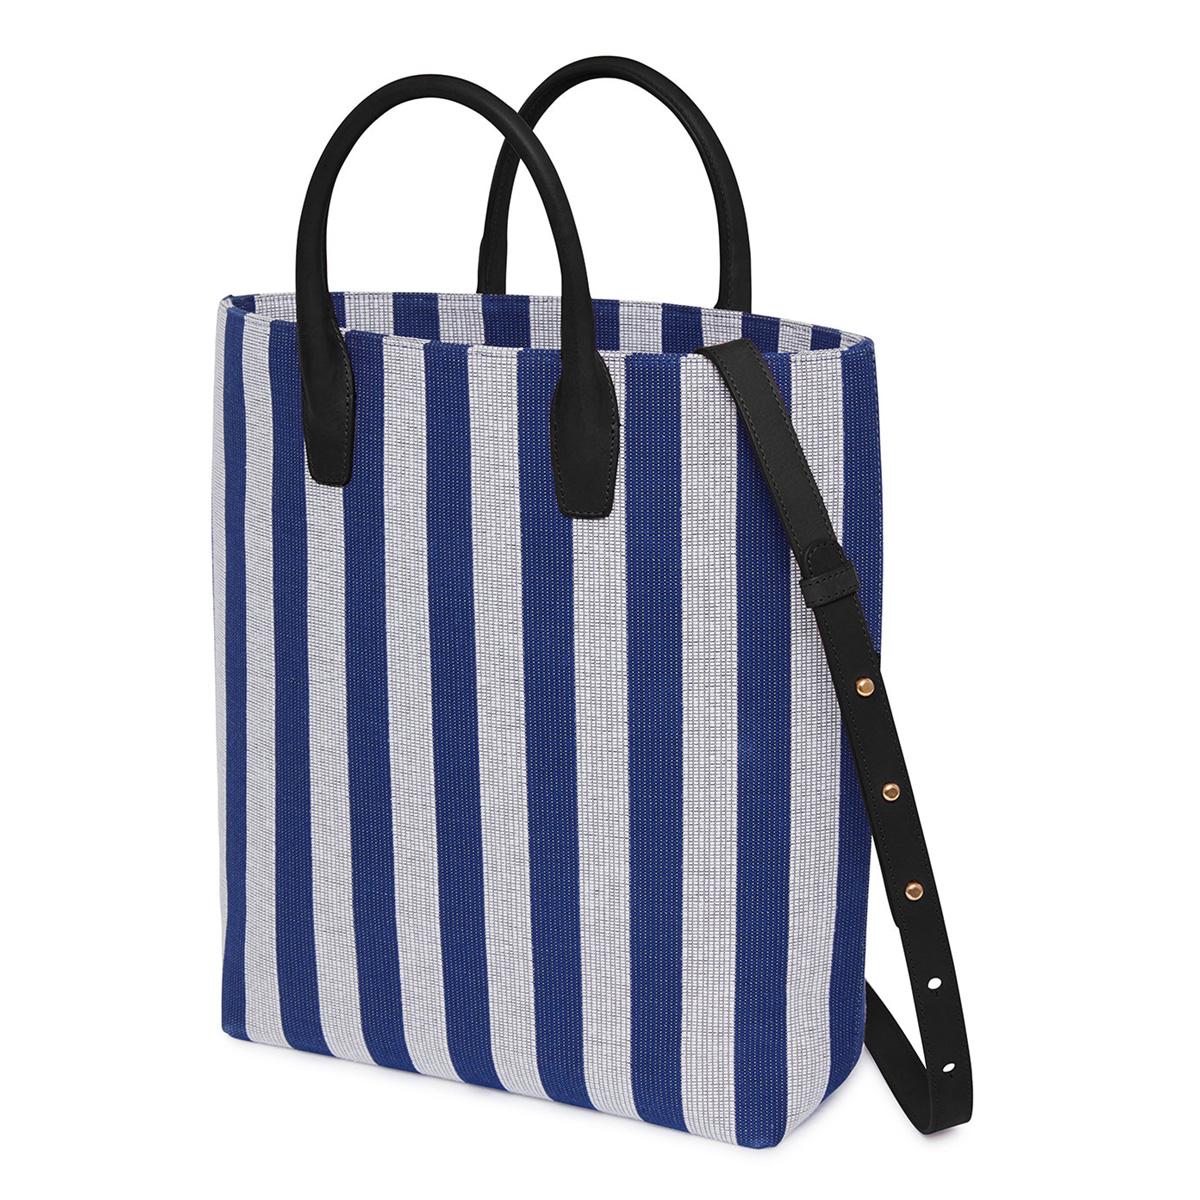 mansur gavriel striped blue.jpg